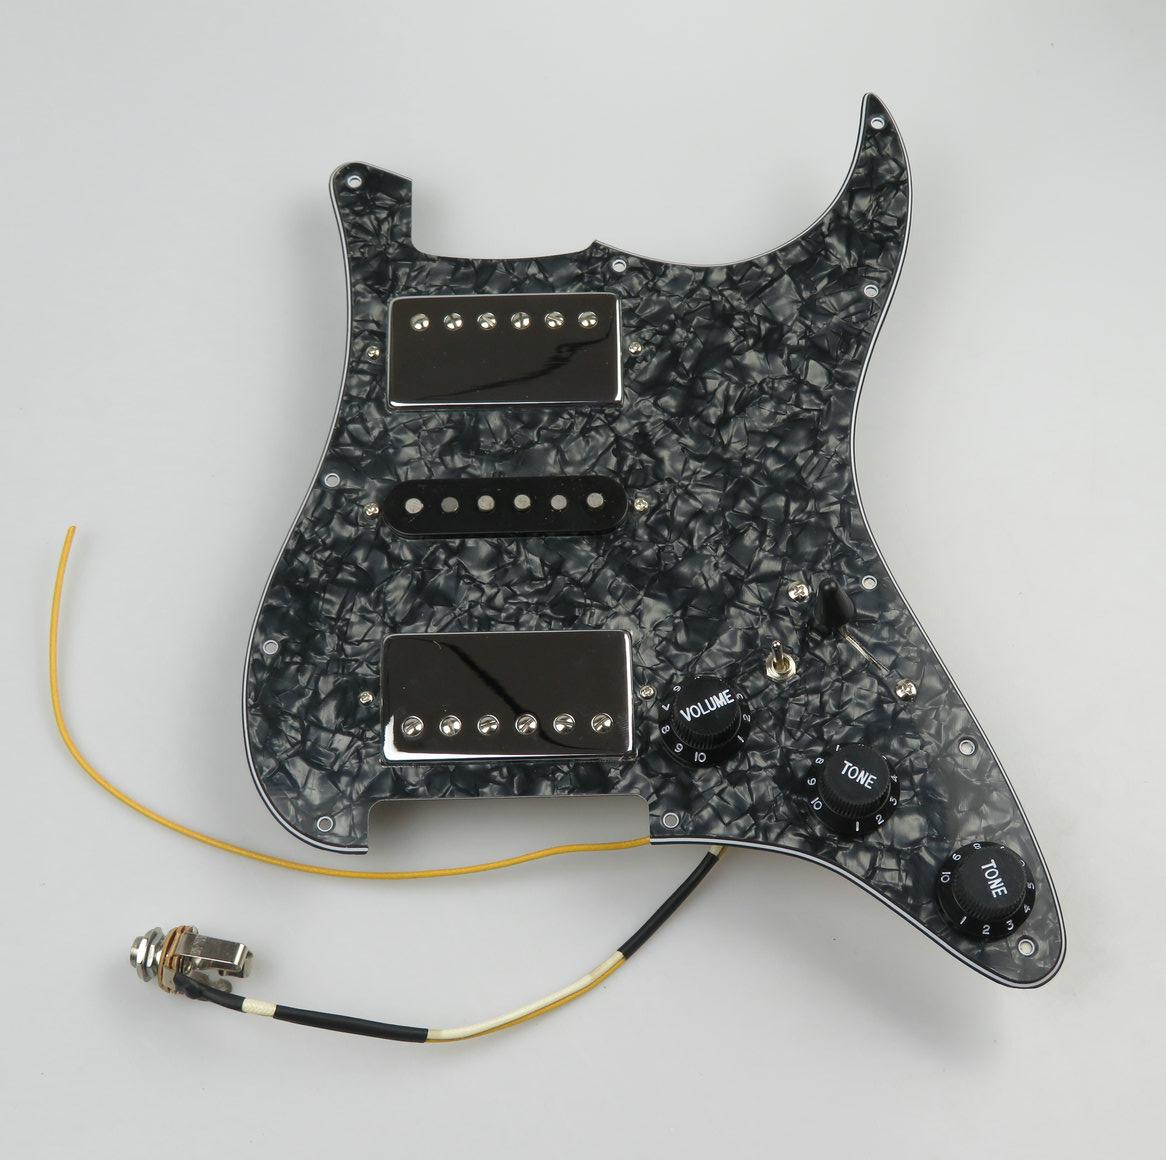 Pickup per chitarra Prewired PickGuard Alnico5 Humbucker Pickups HSH Style Guitar Parts per la chitarra Strat